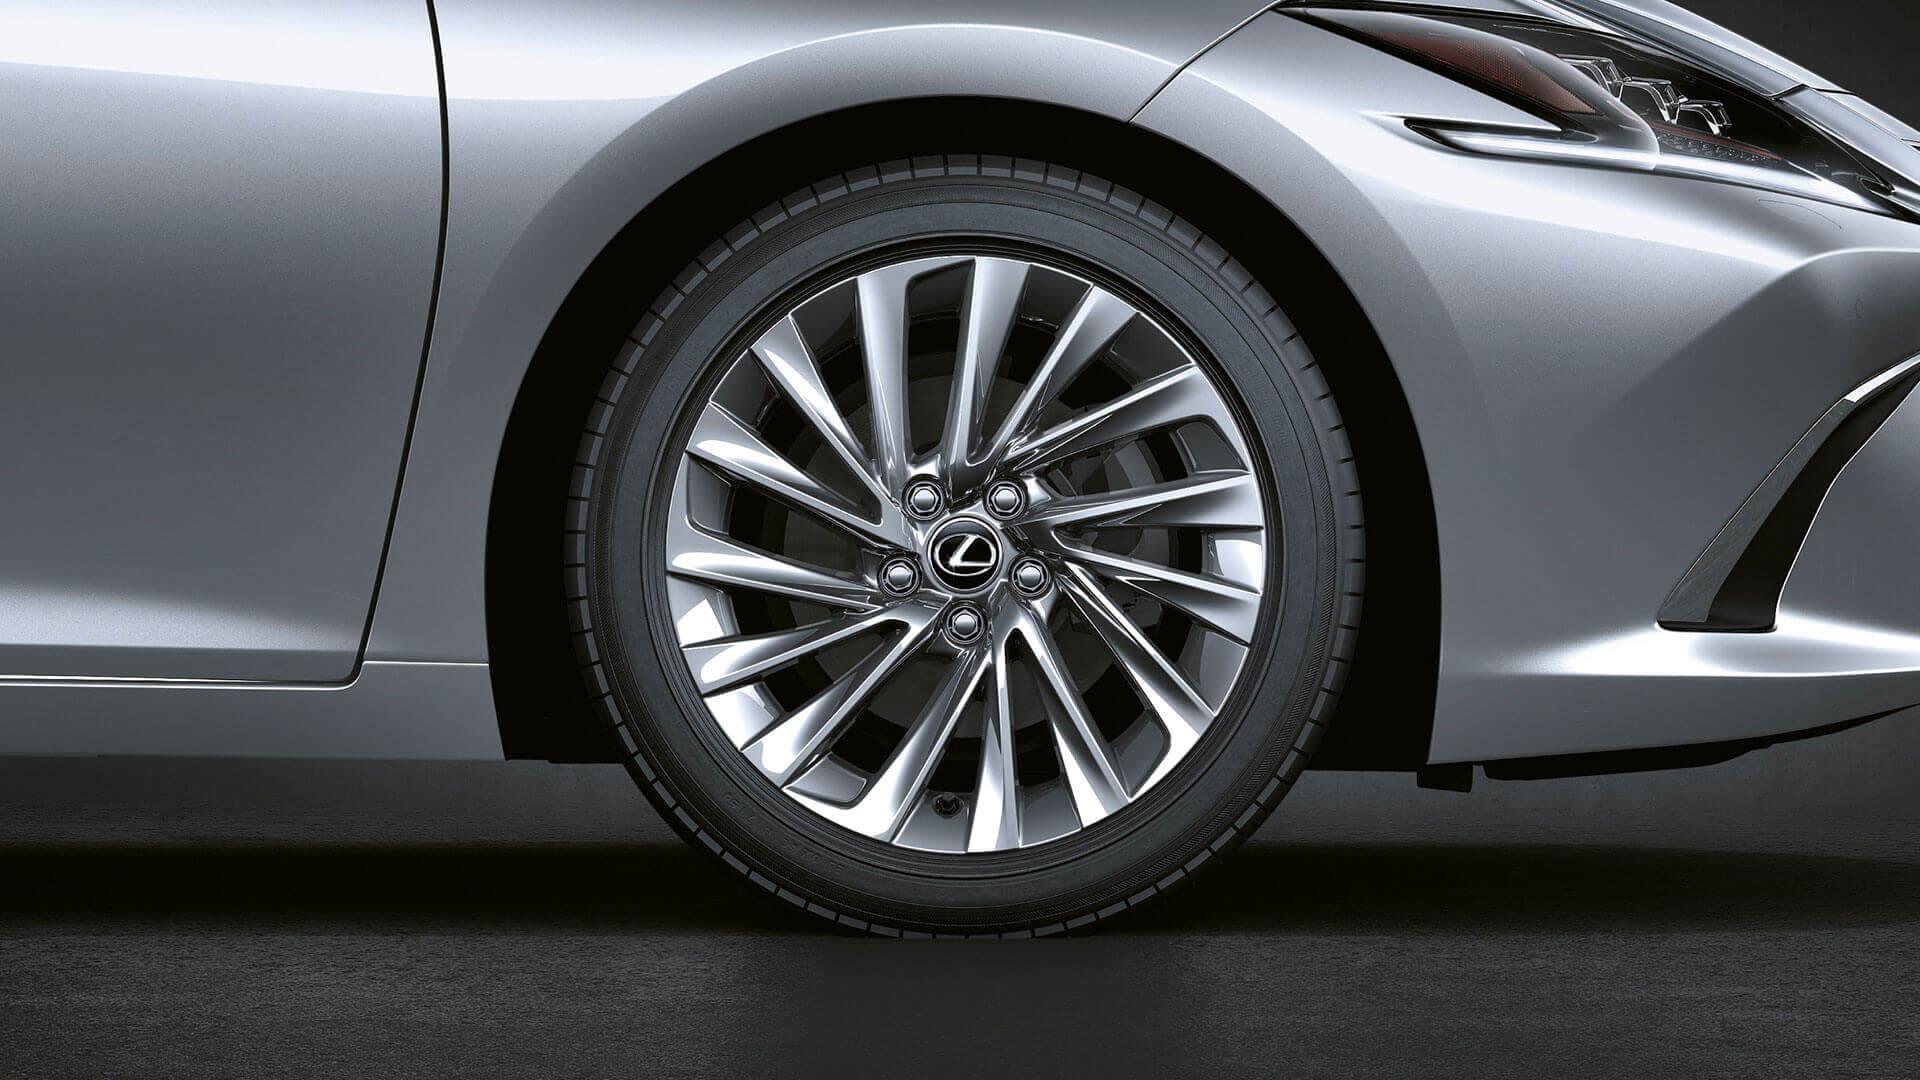 2019 lexus es hybrid experience feature noise reducing wheels